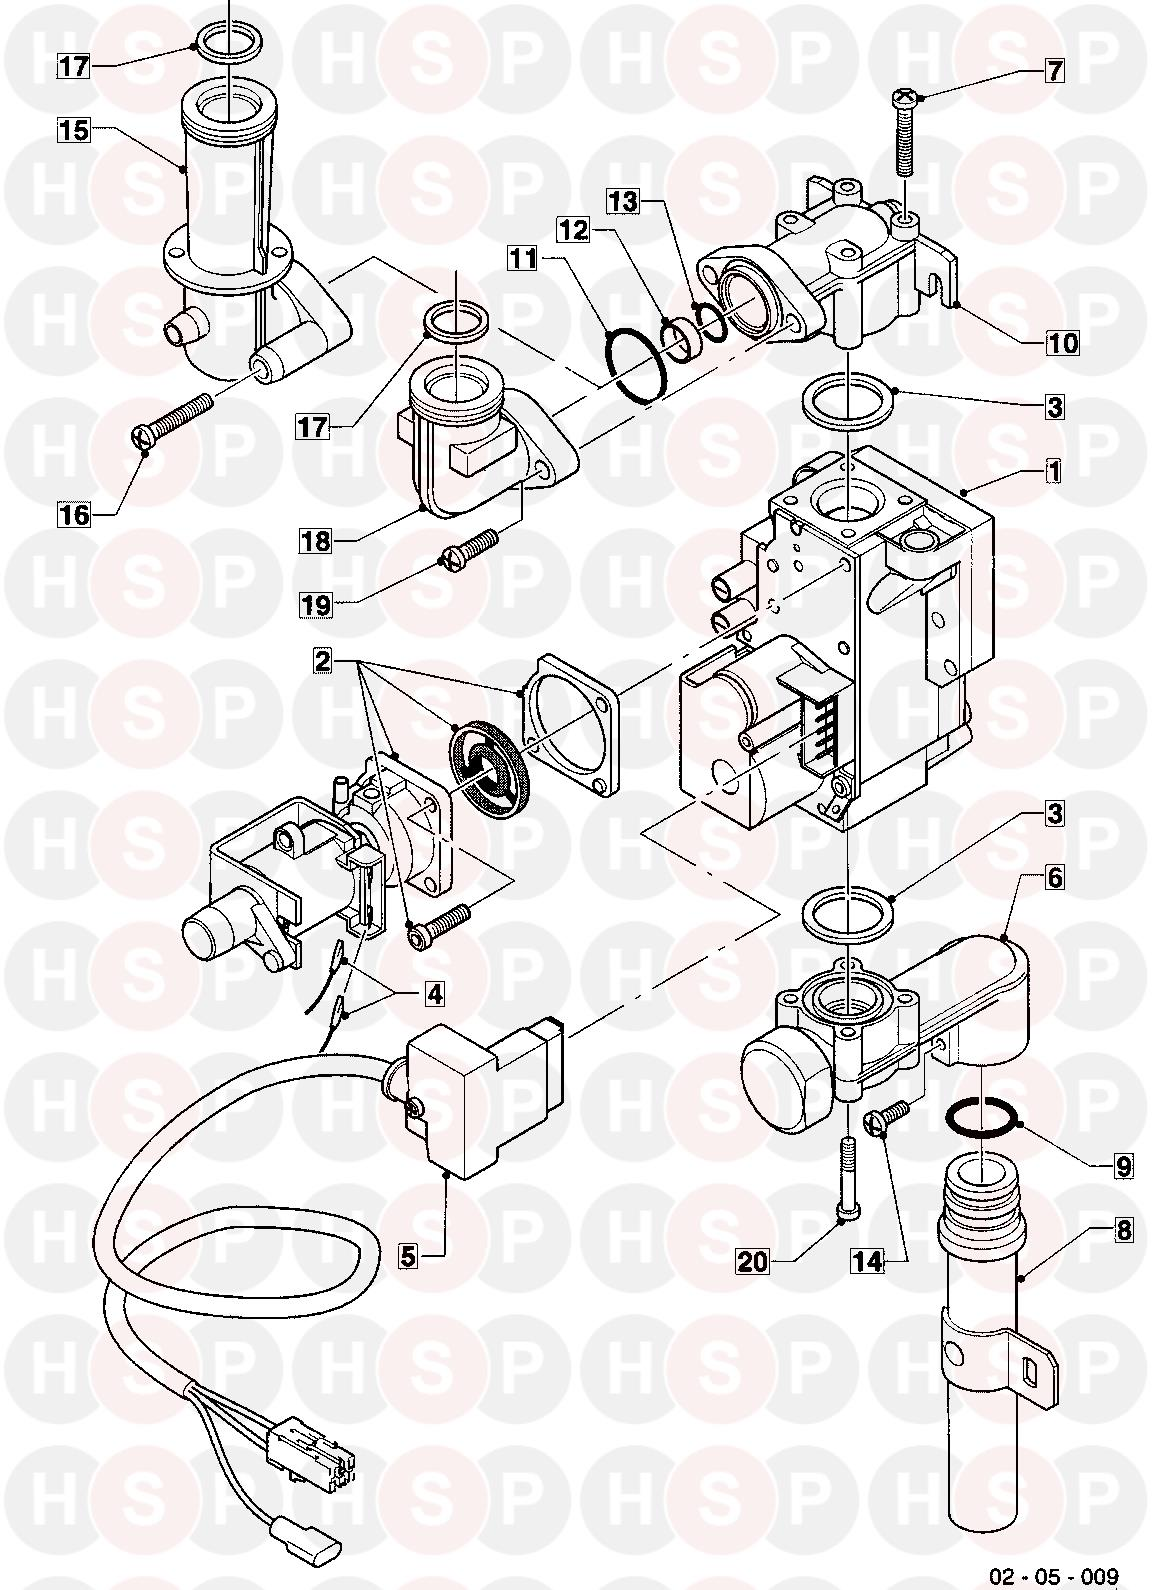 vaillant turbomax vuw 242  1e 1998